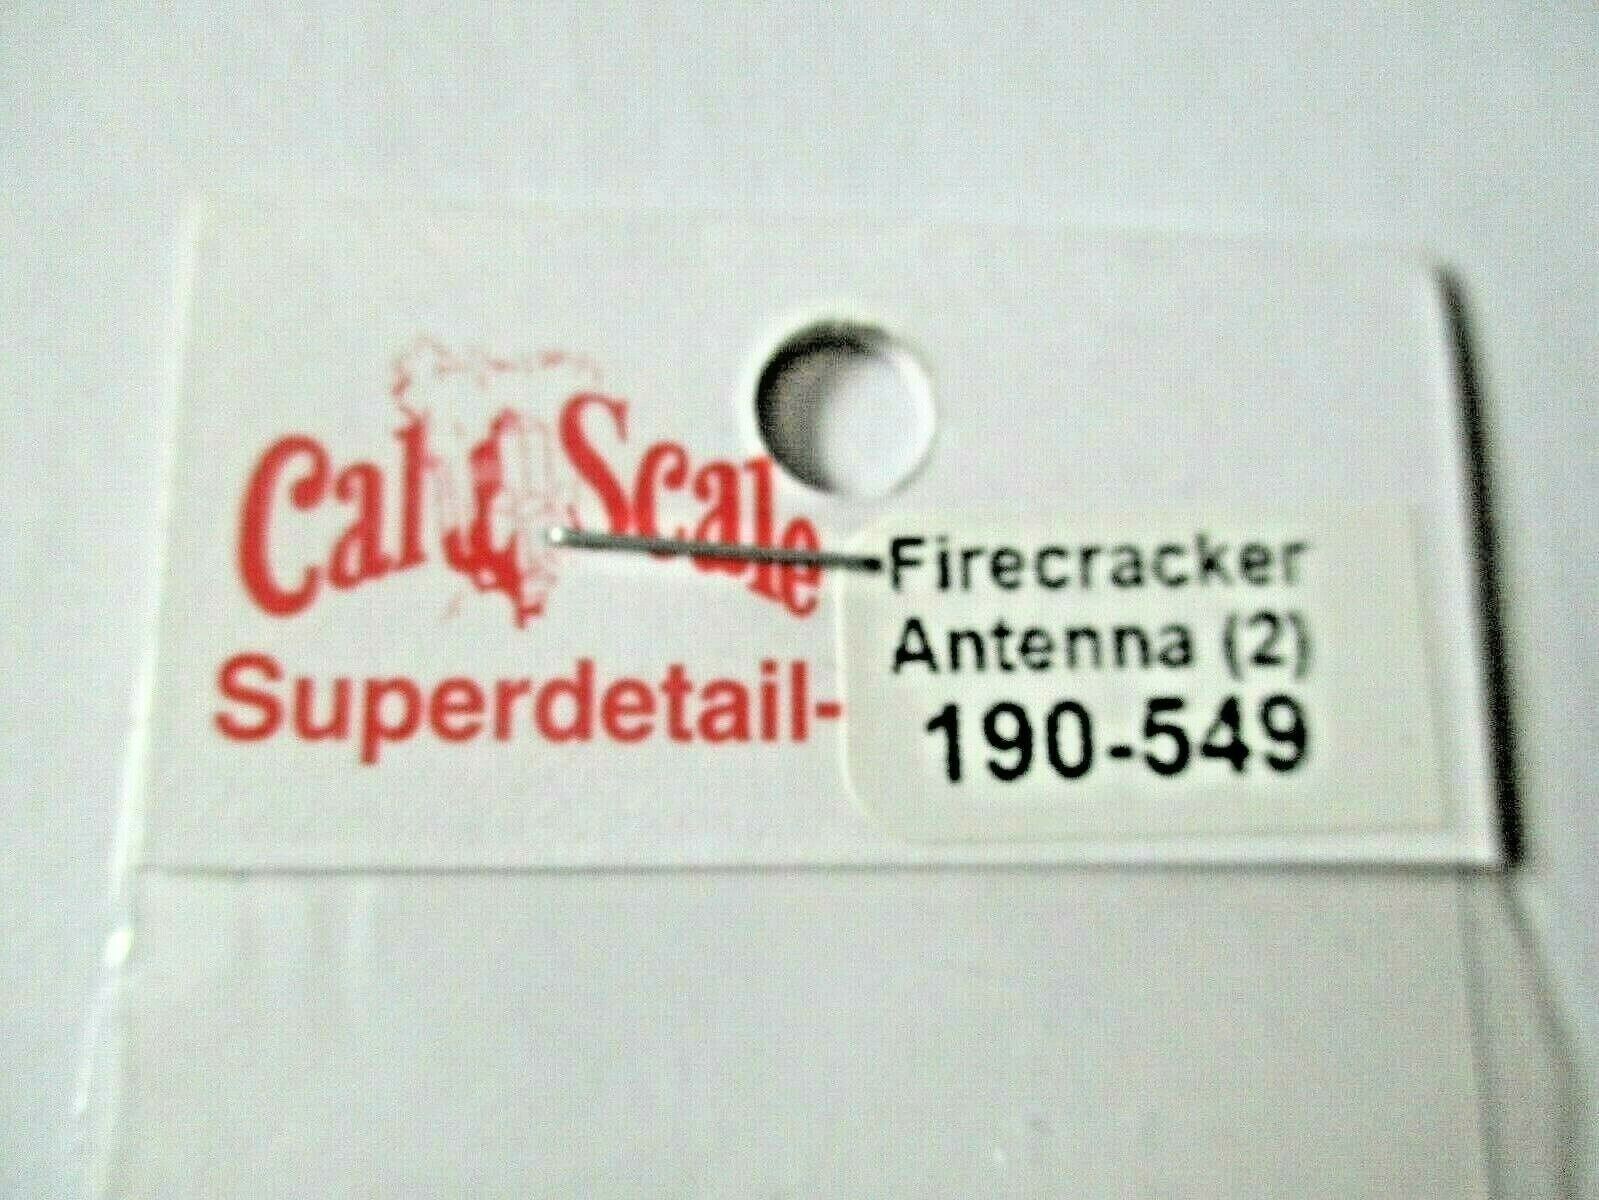 Cal Cal Scale # 190-549 Brass Firecracker Antenna 2 Pack HO Scale